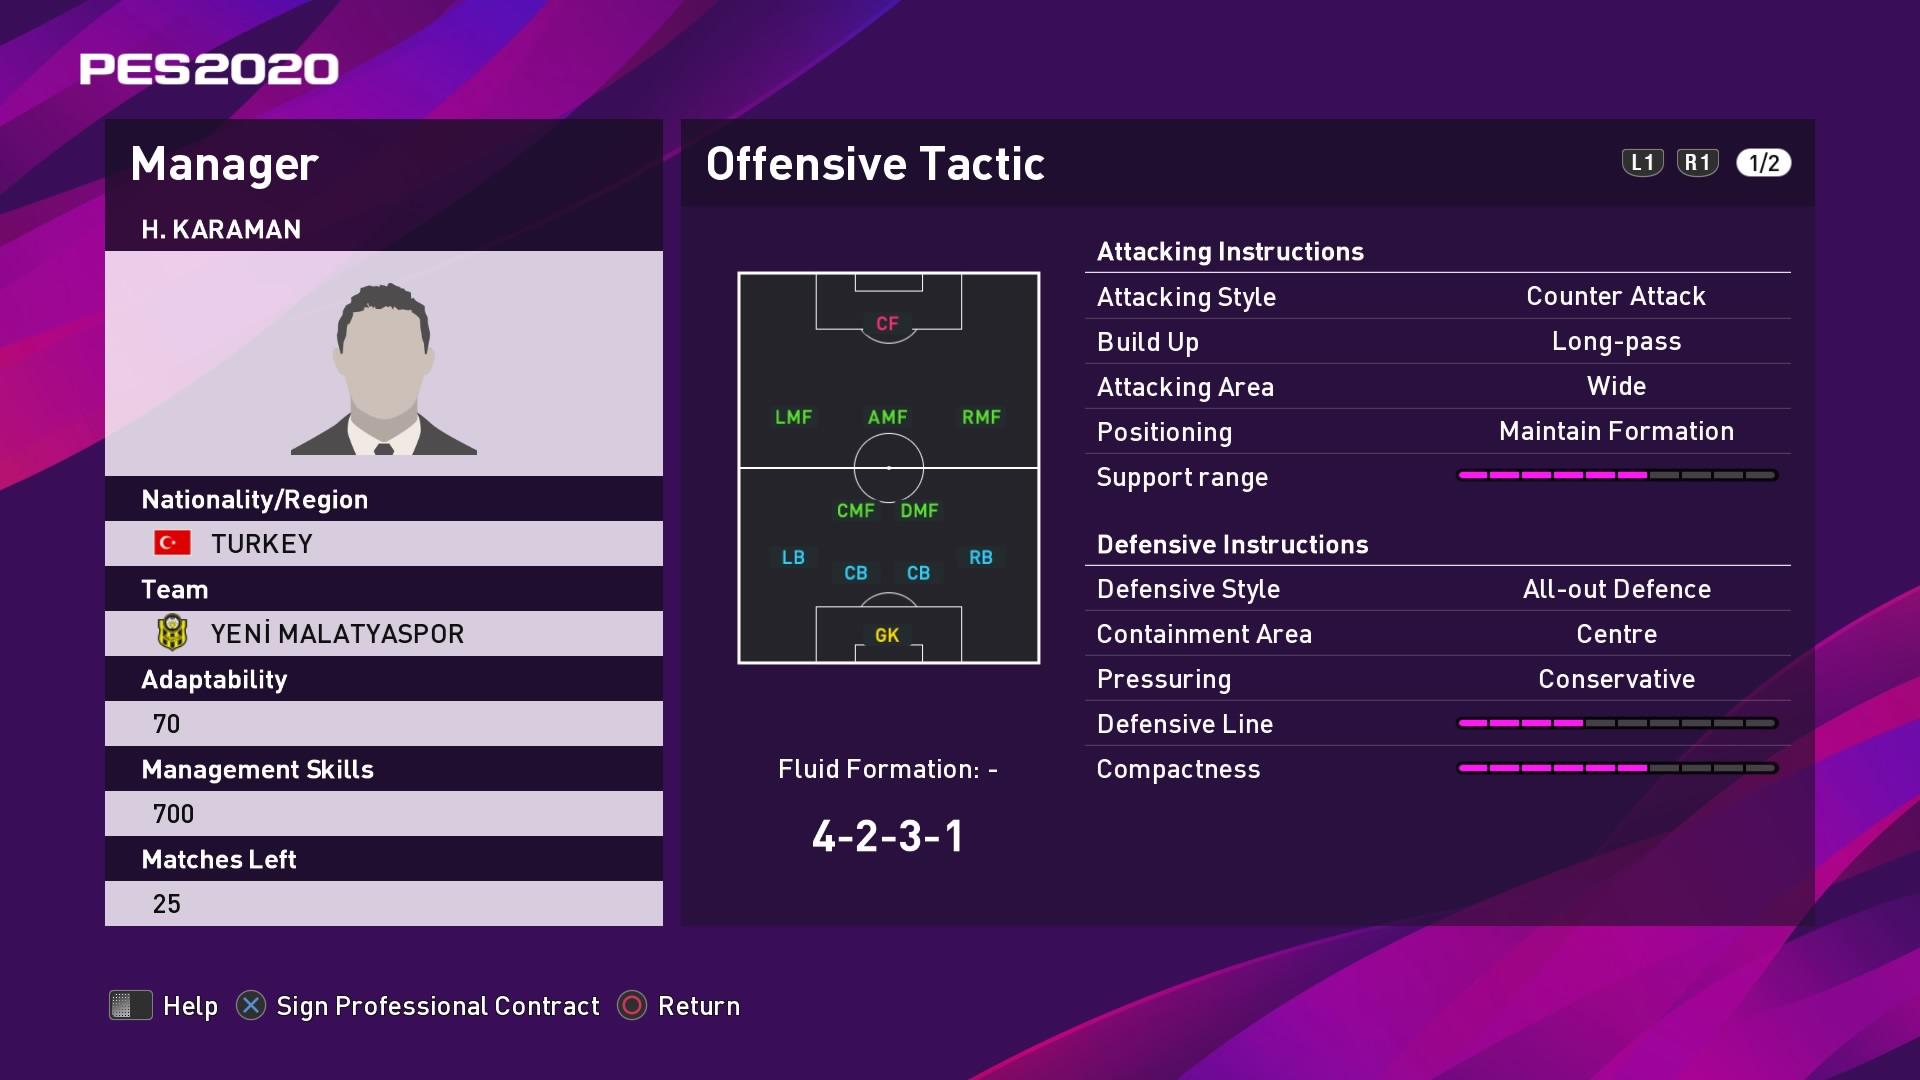 H. Karaman (Hikmet Karaman) Offensive Tactic in PES 2020 myClub